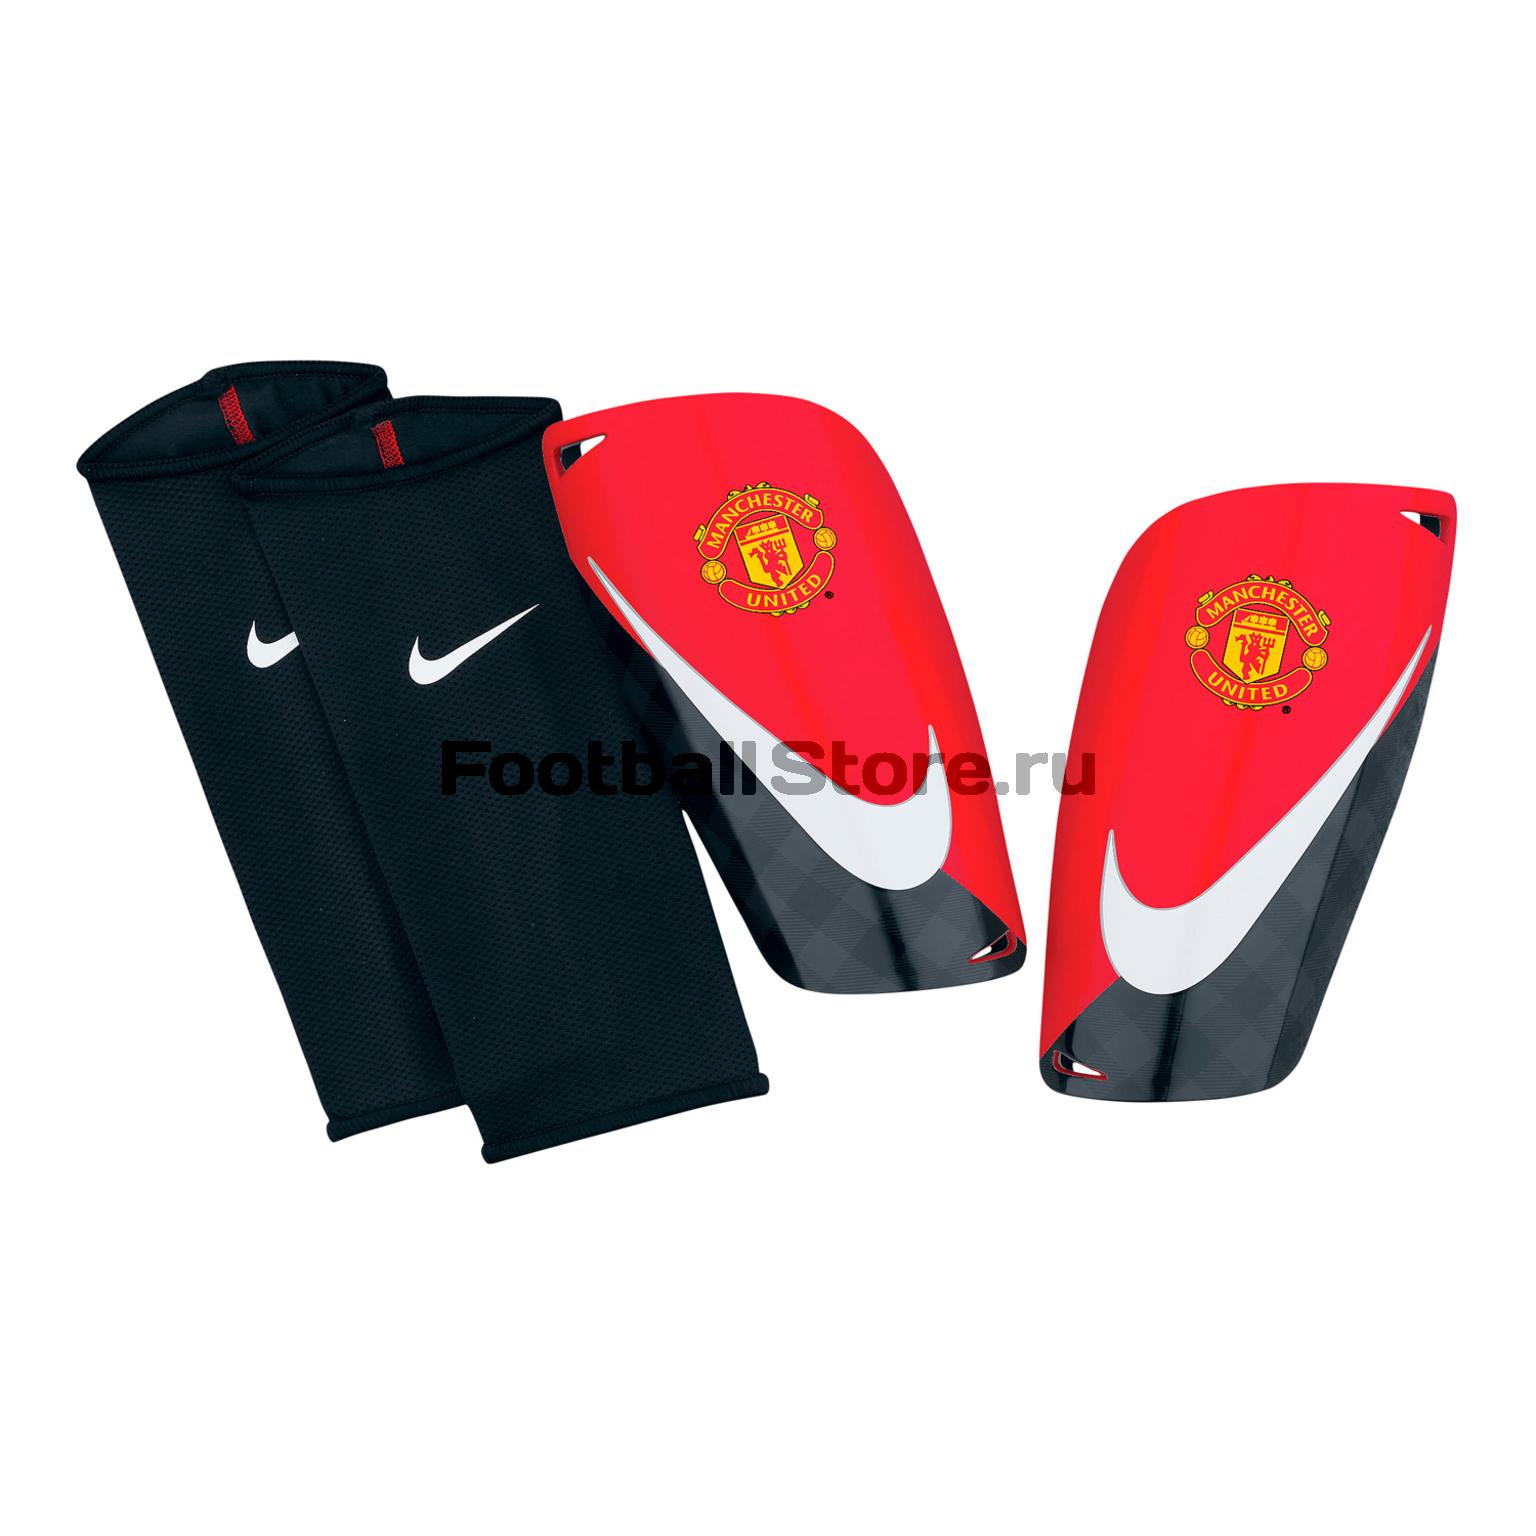 Manchester United Nike Щитки футбольные Nike Mercurial Lite Manchester Untd SP0273-601